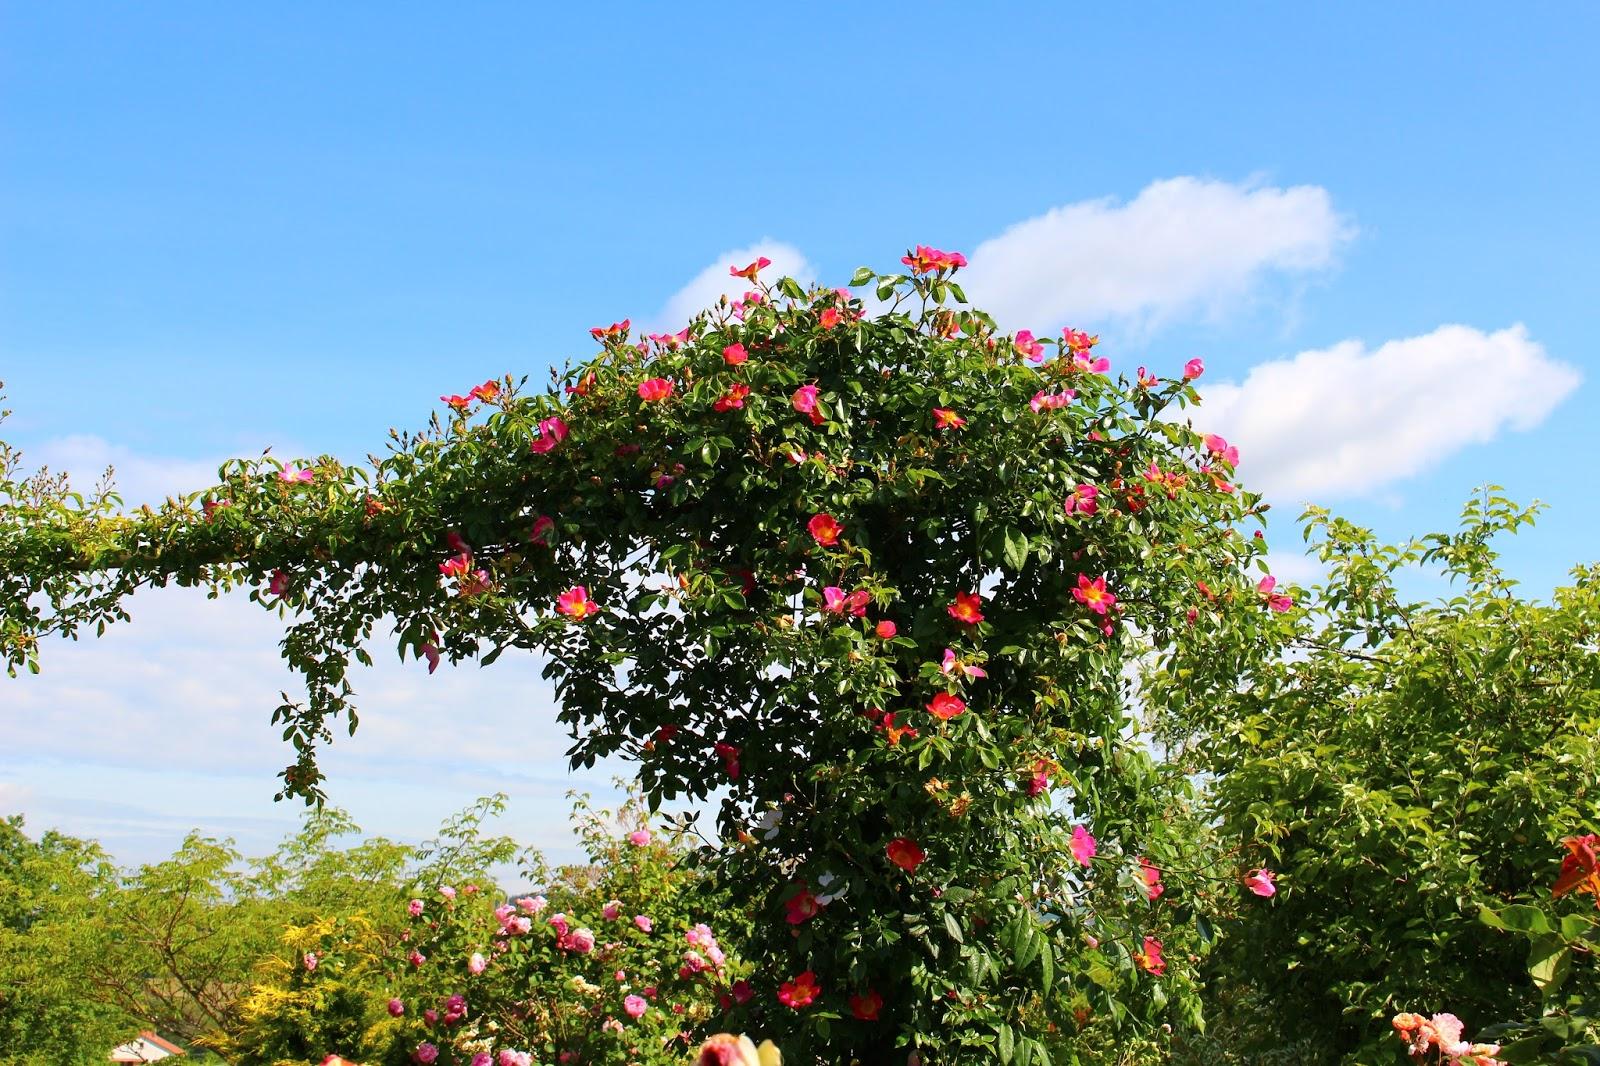 roses du jardin ch neland taille des rosiers lianes. Black Bedroom Furniture Sets. Home Design Ideas